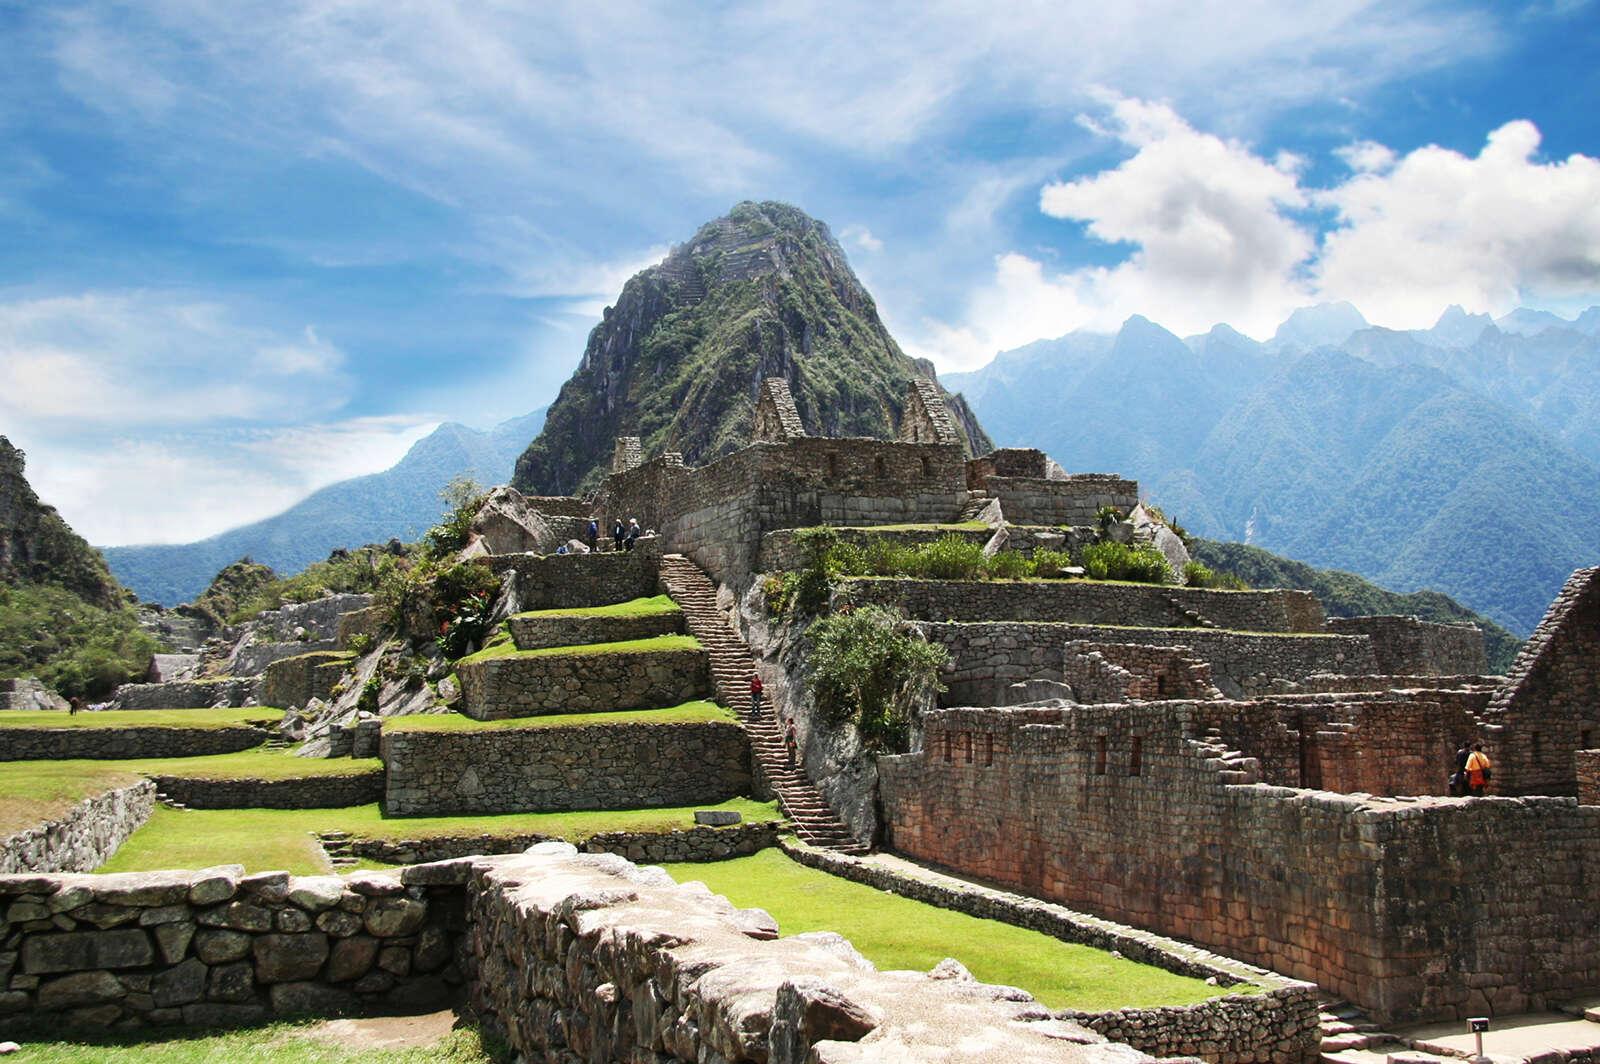 Goway Travel - Ecuador Cruise On Sale Now!